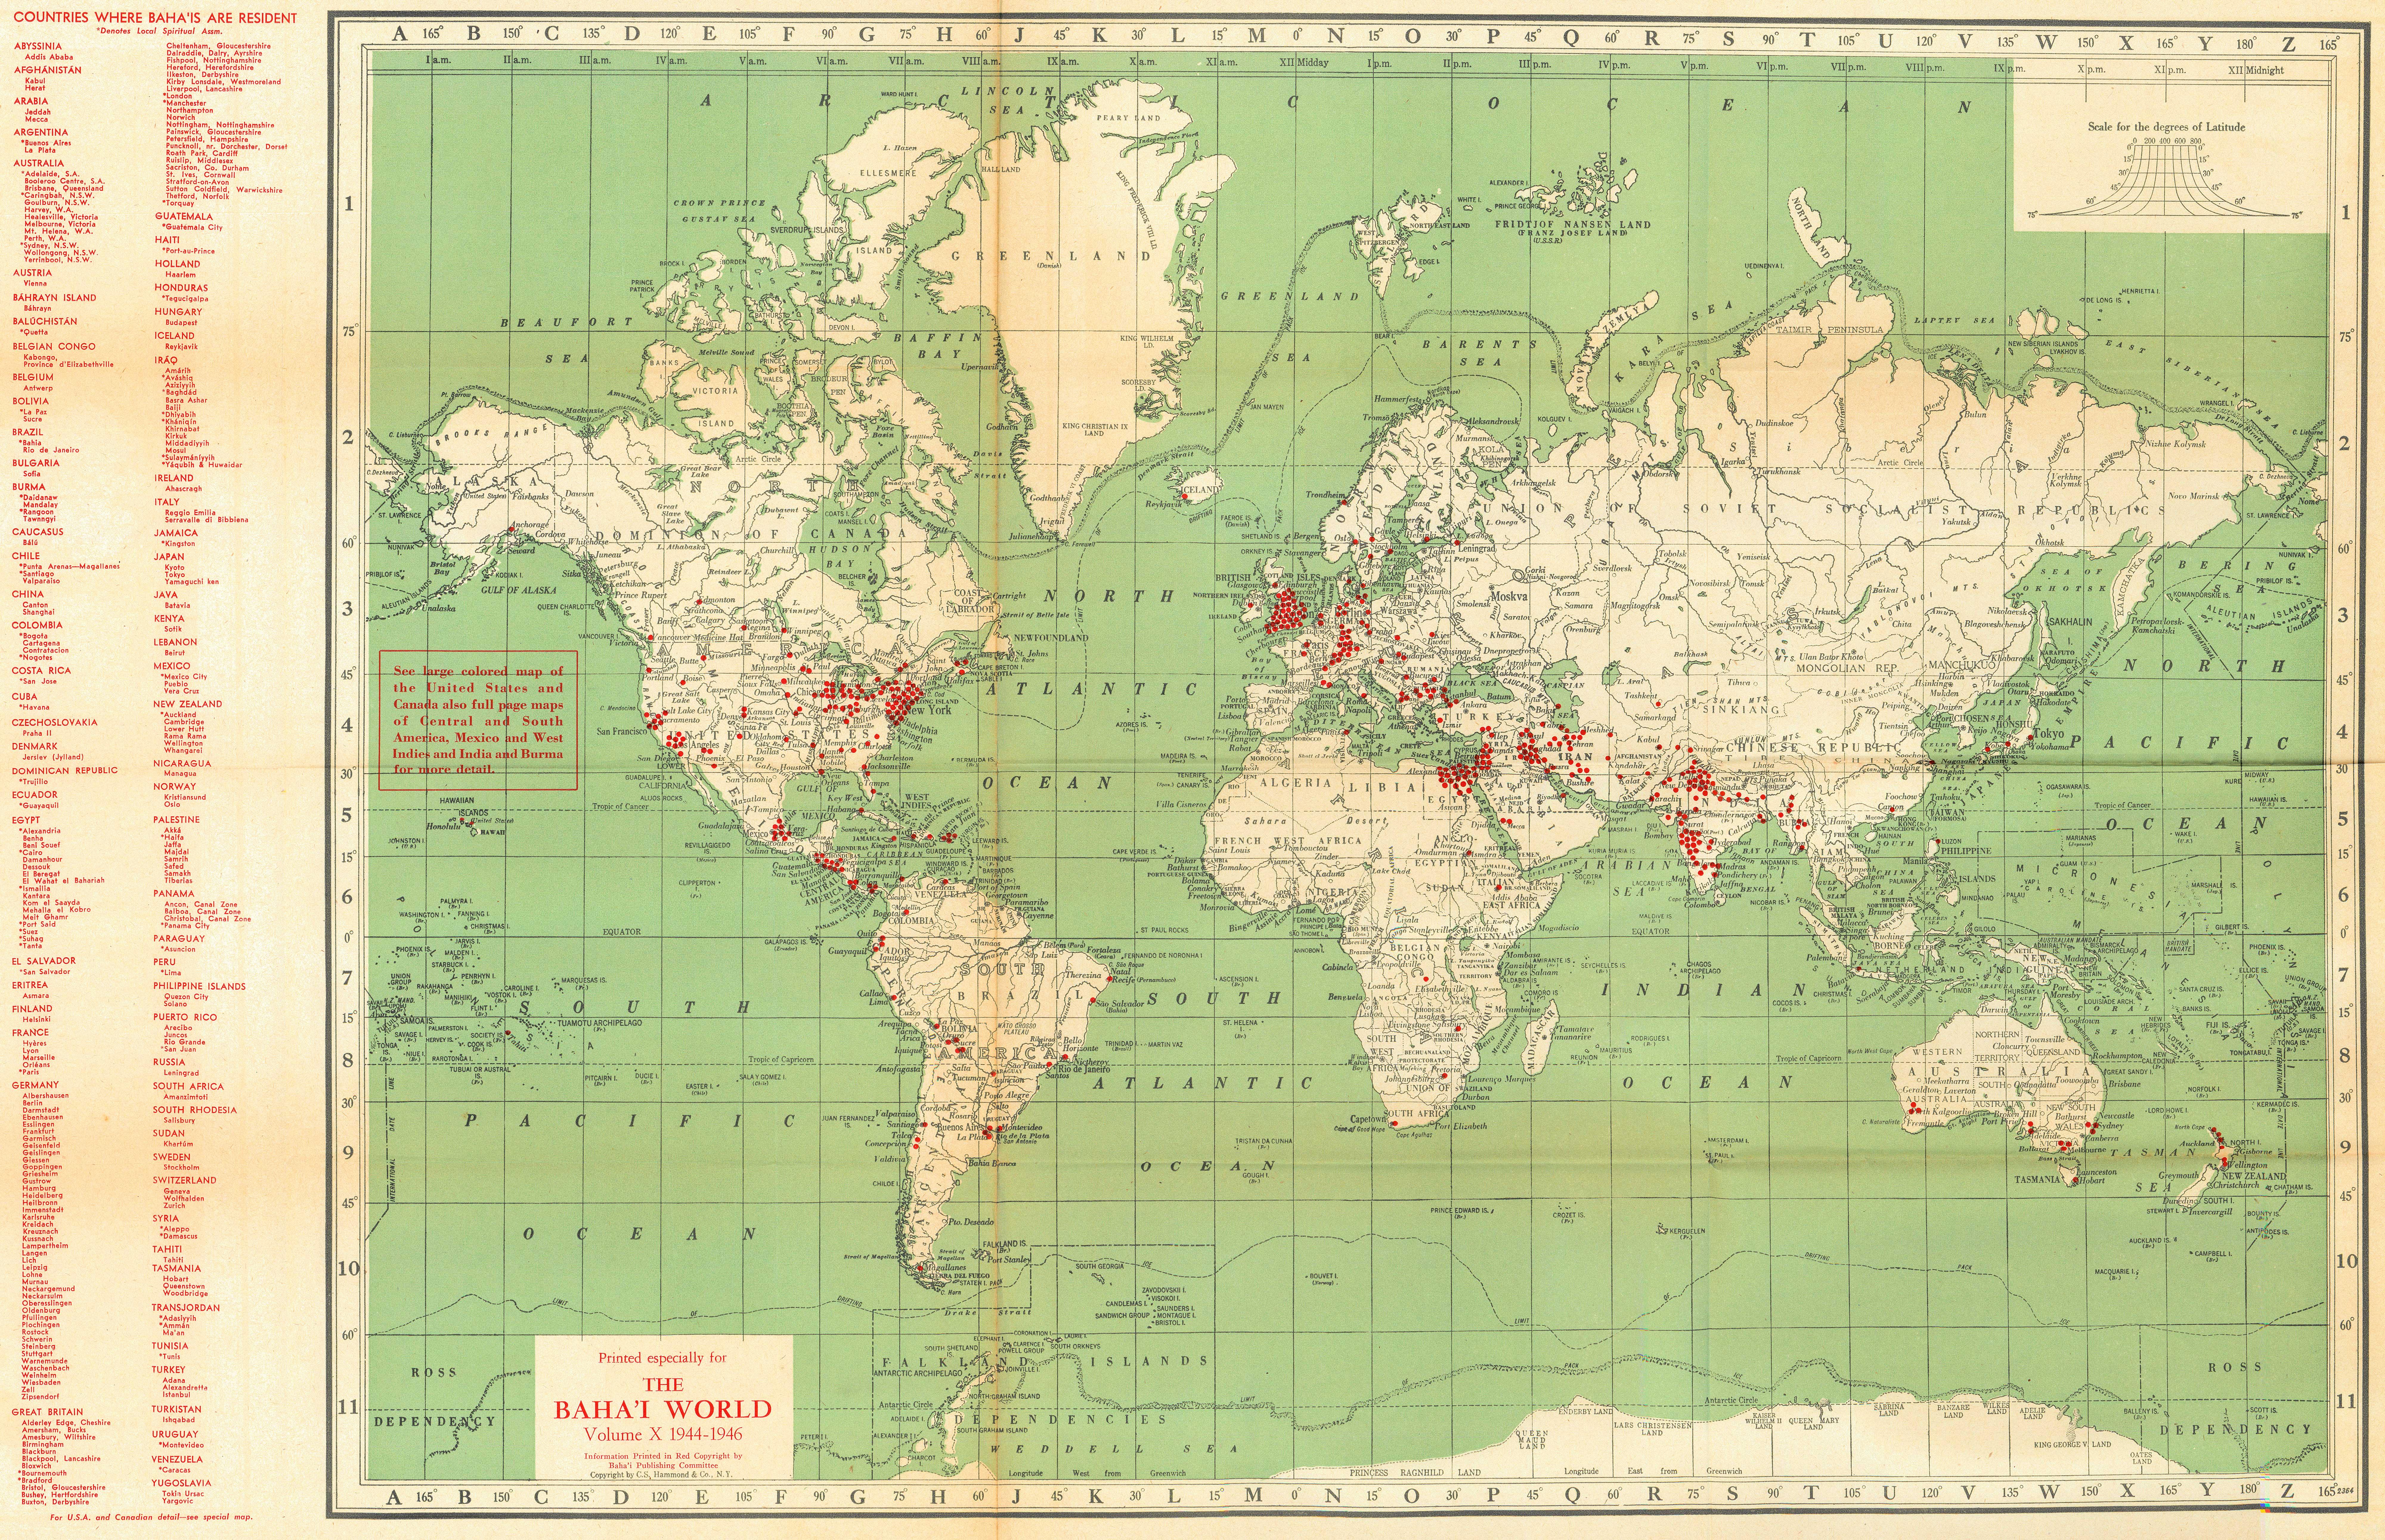 Localities where Bah 39 s live world 1944